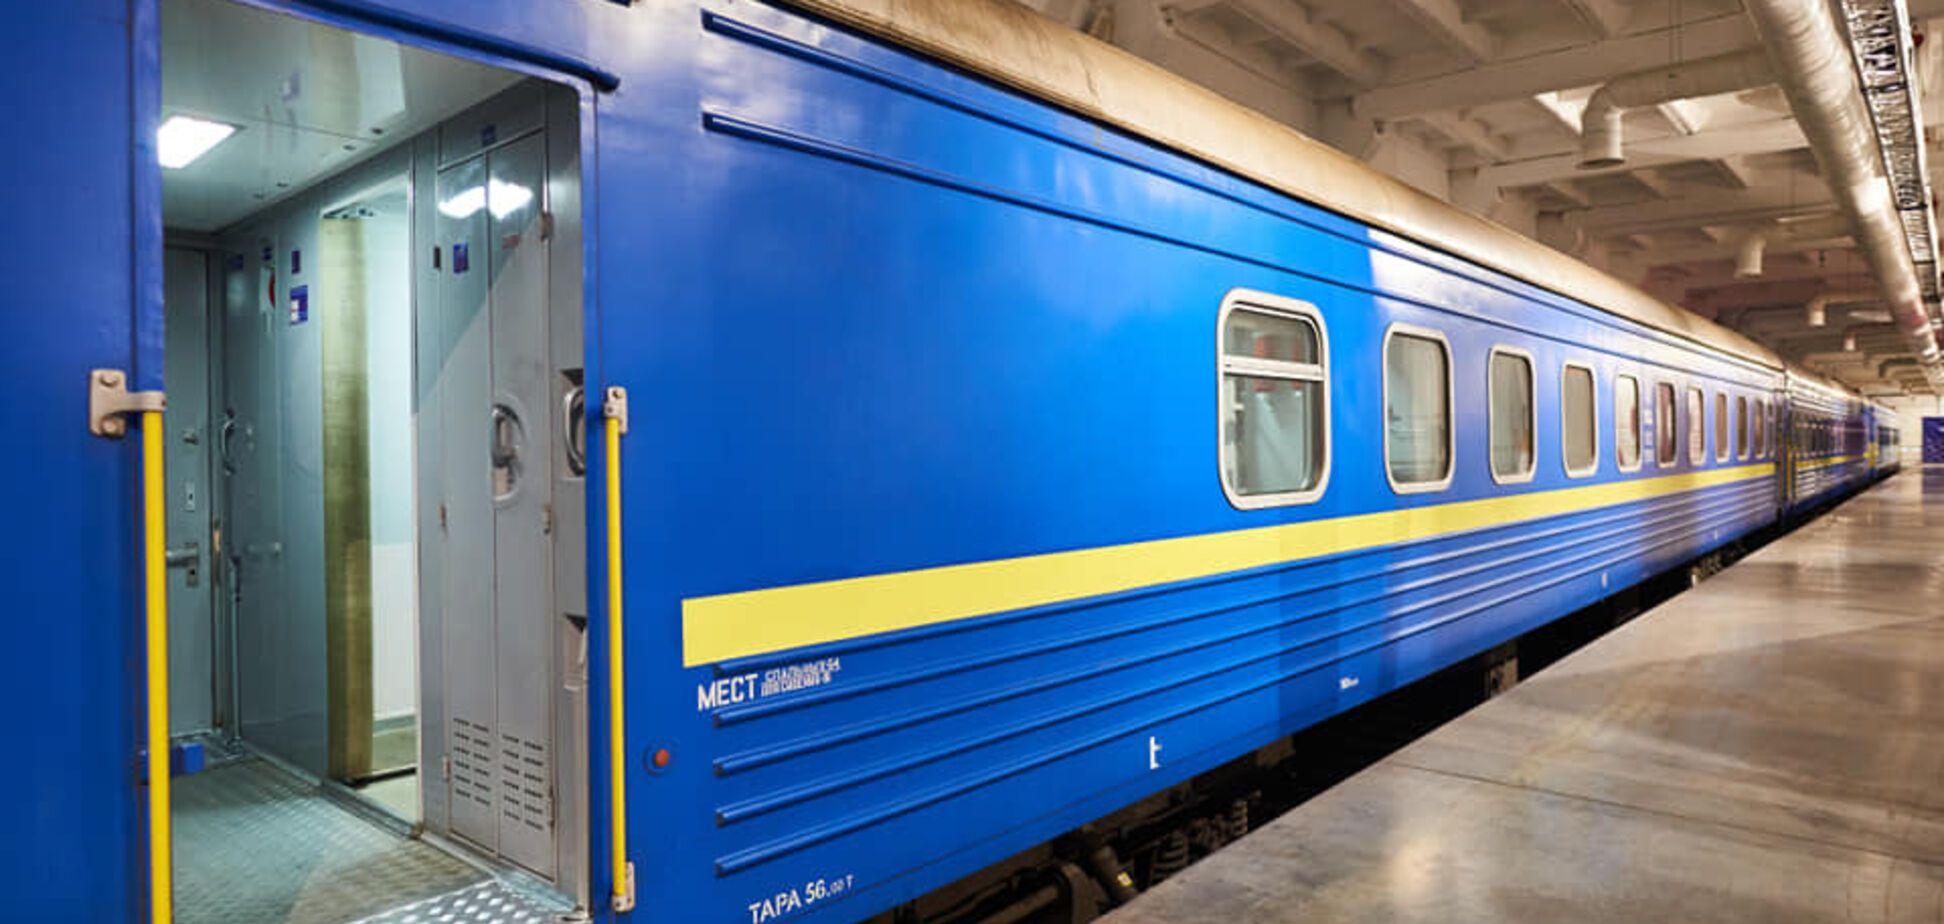 'Укрзалізниця' передаст вокзалы в аренду компаниям